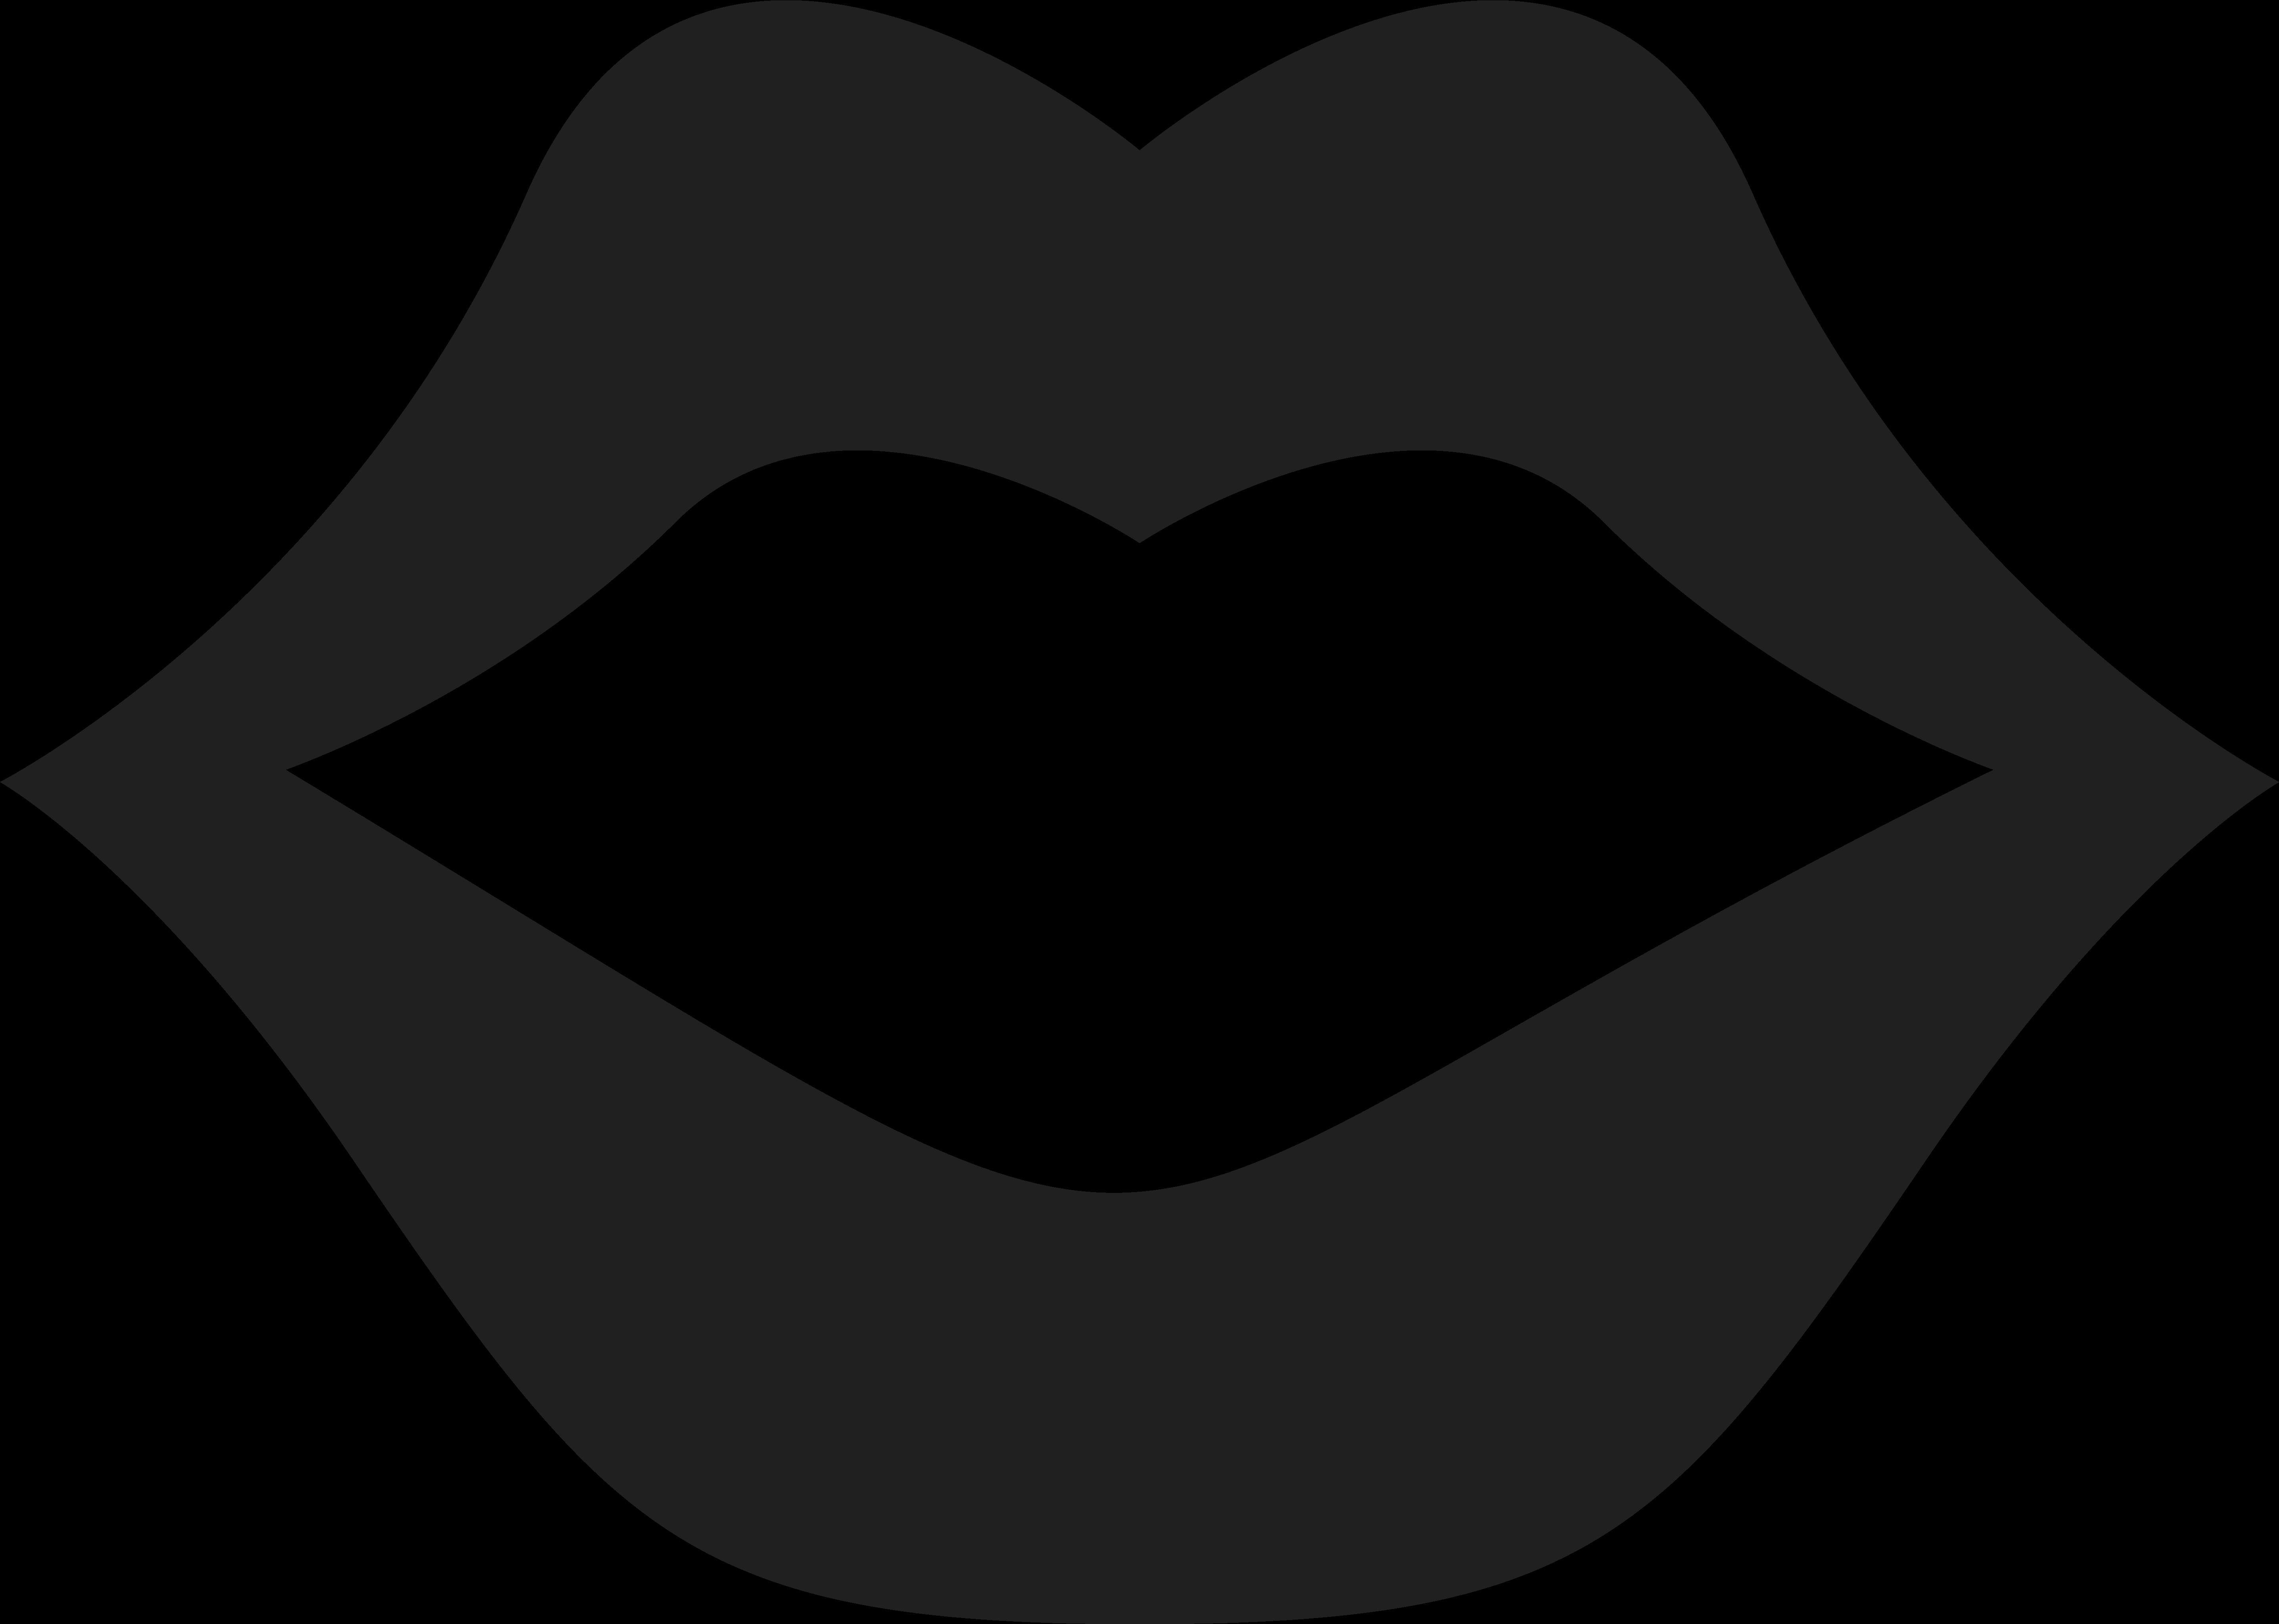 Kiss Clipart Images Clip Art Clipart Images Kiss Illustration